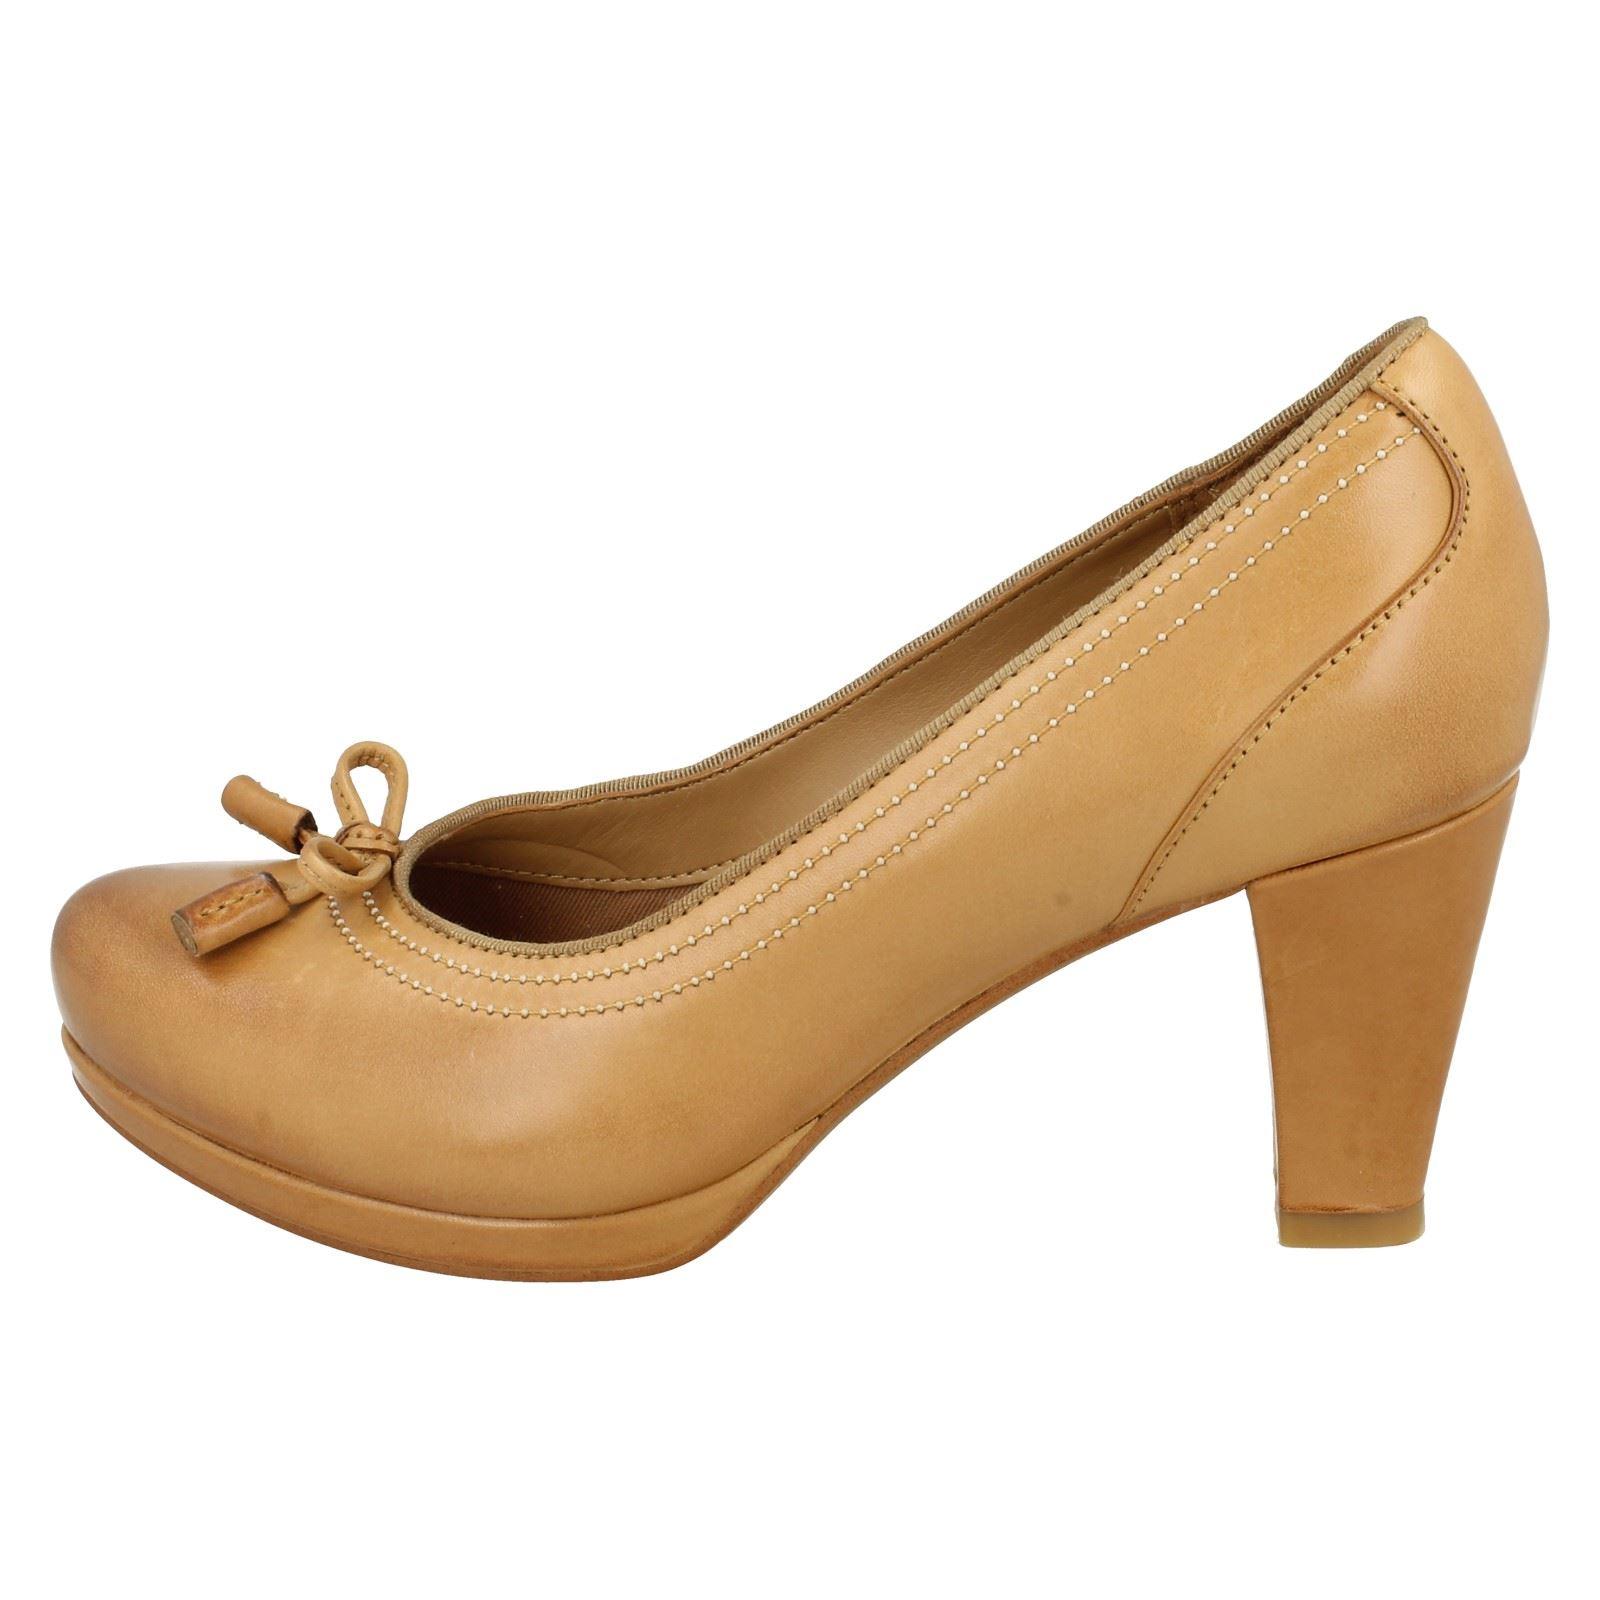 Ladies Tan Court Shoes Uk